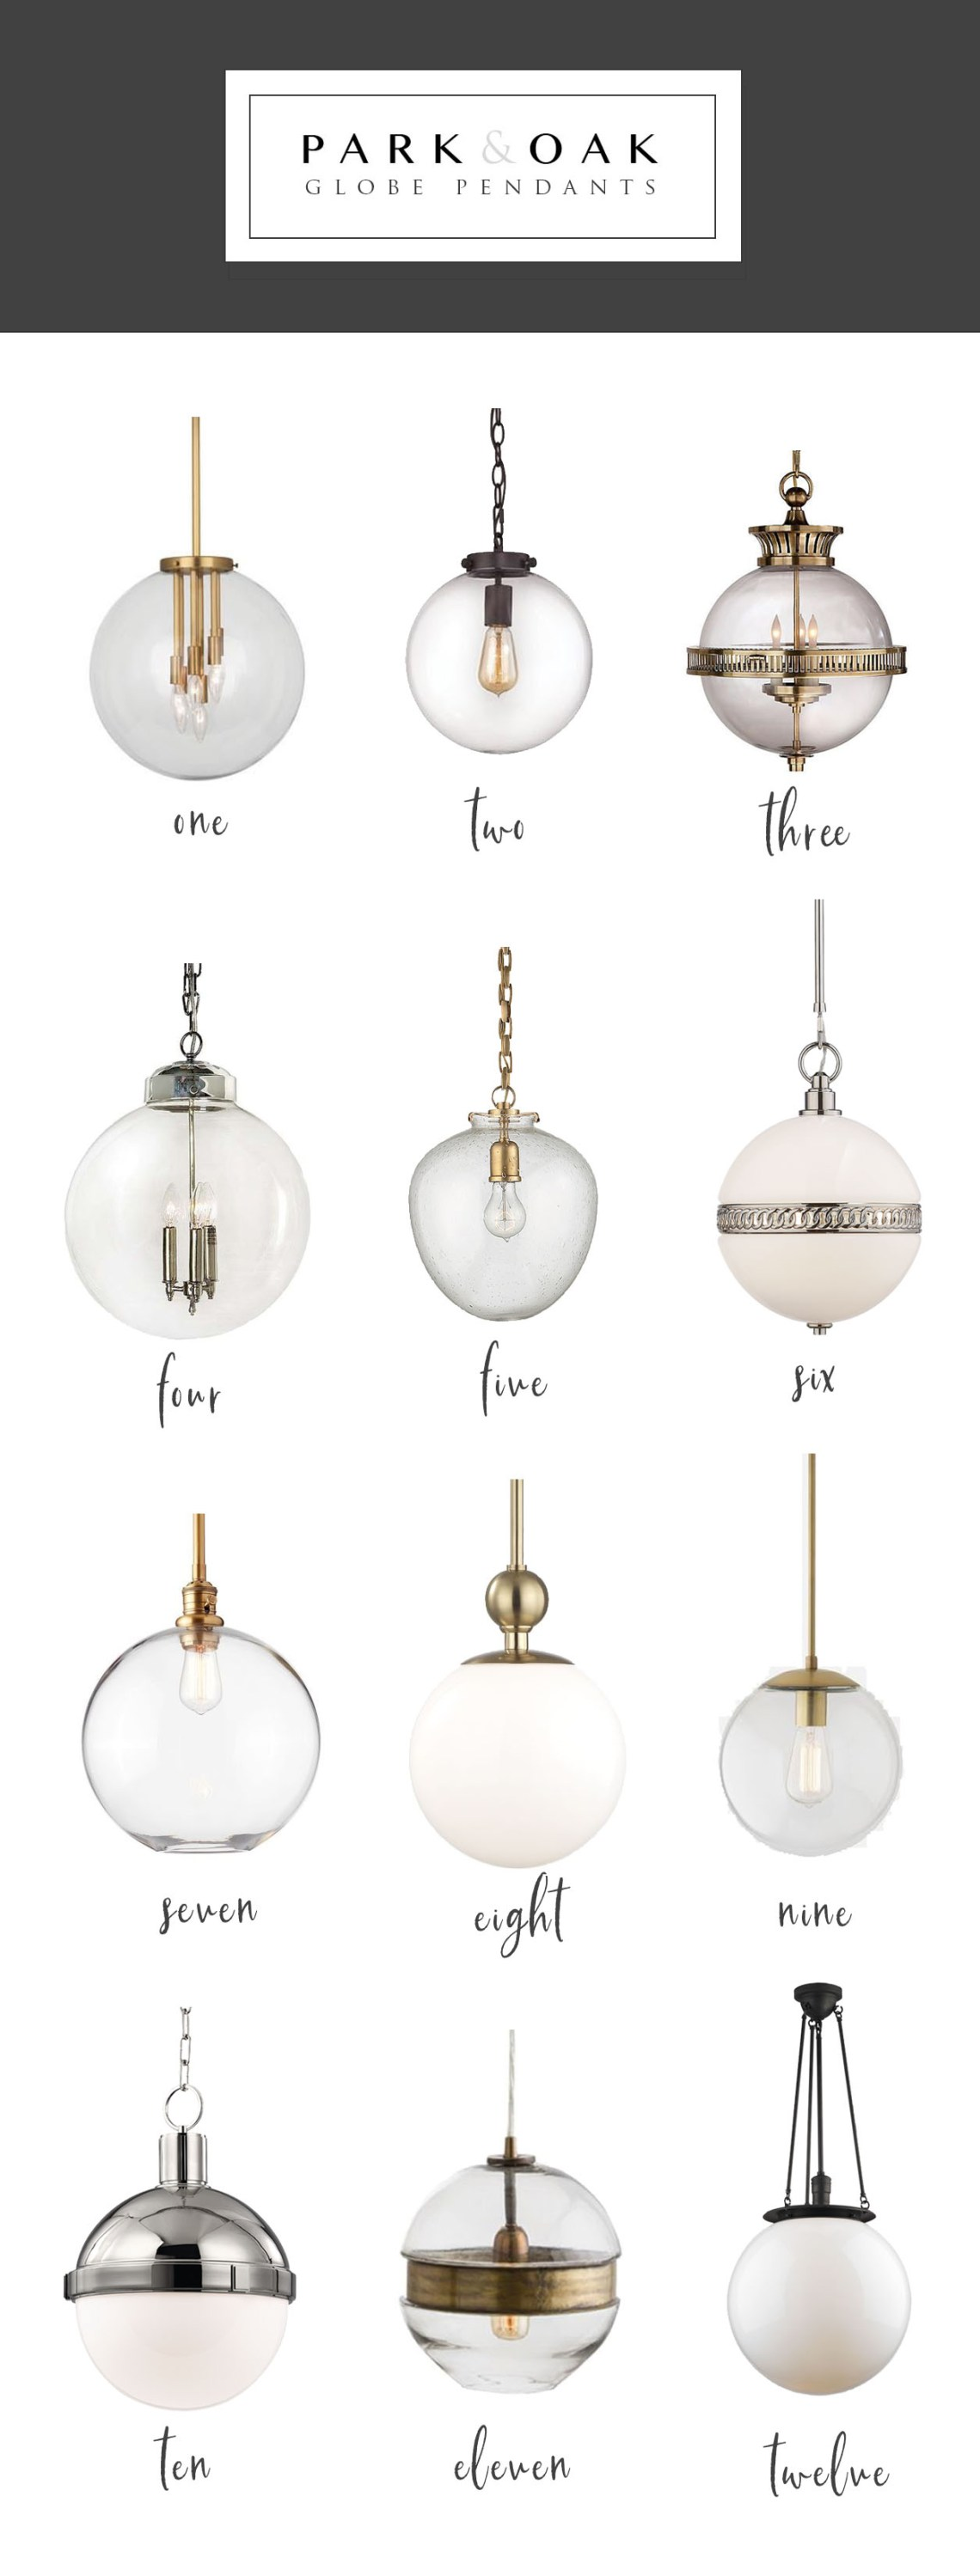 Globe pendants park and oak interior design park and oak design globe pendants aloadofball Image collections